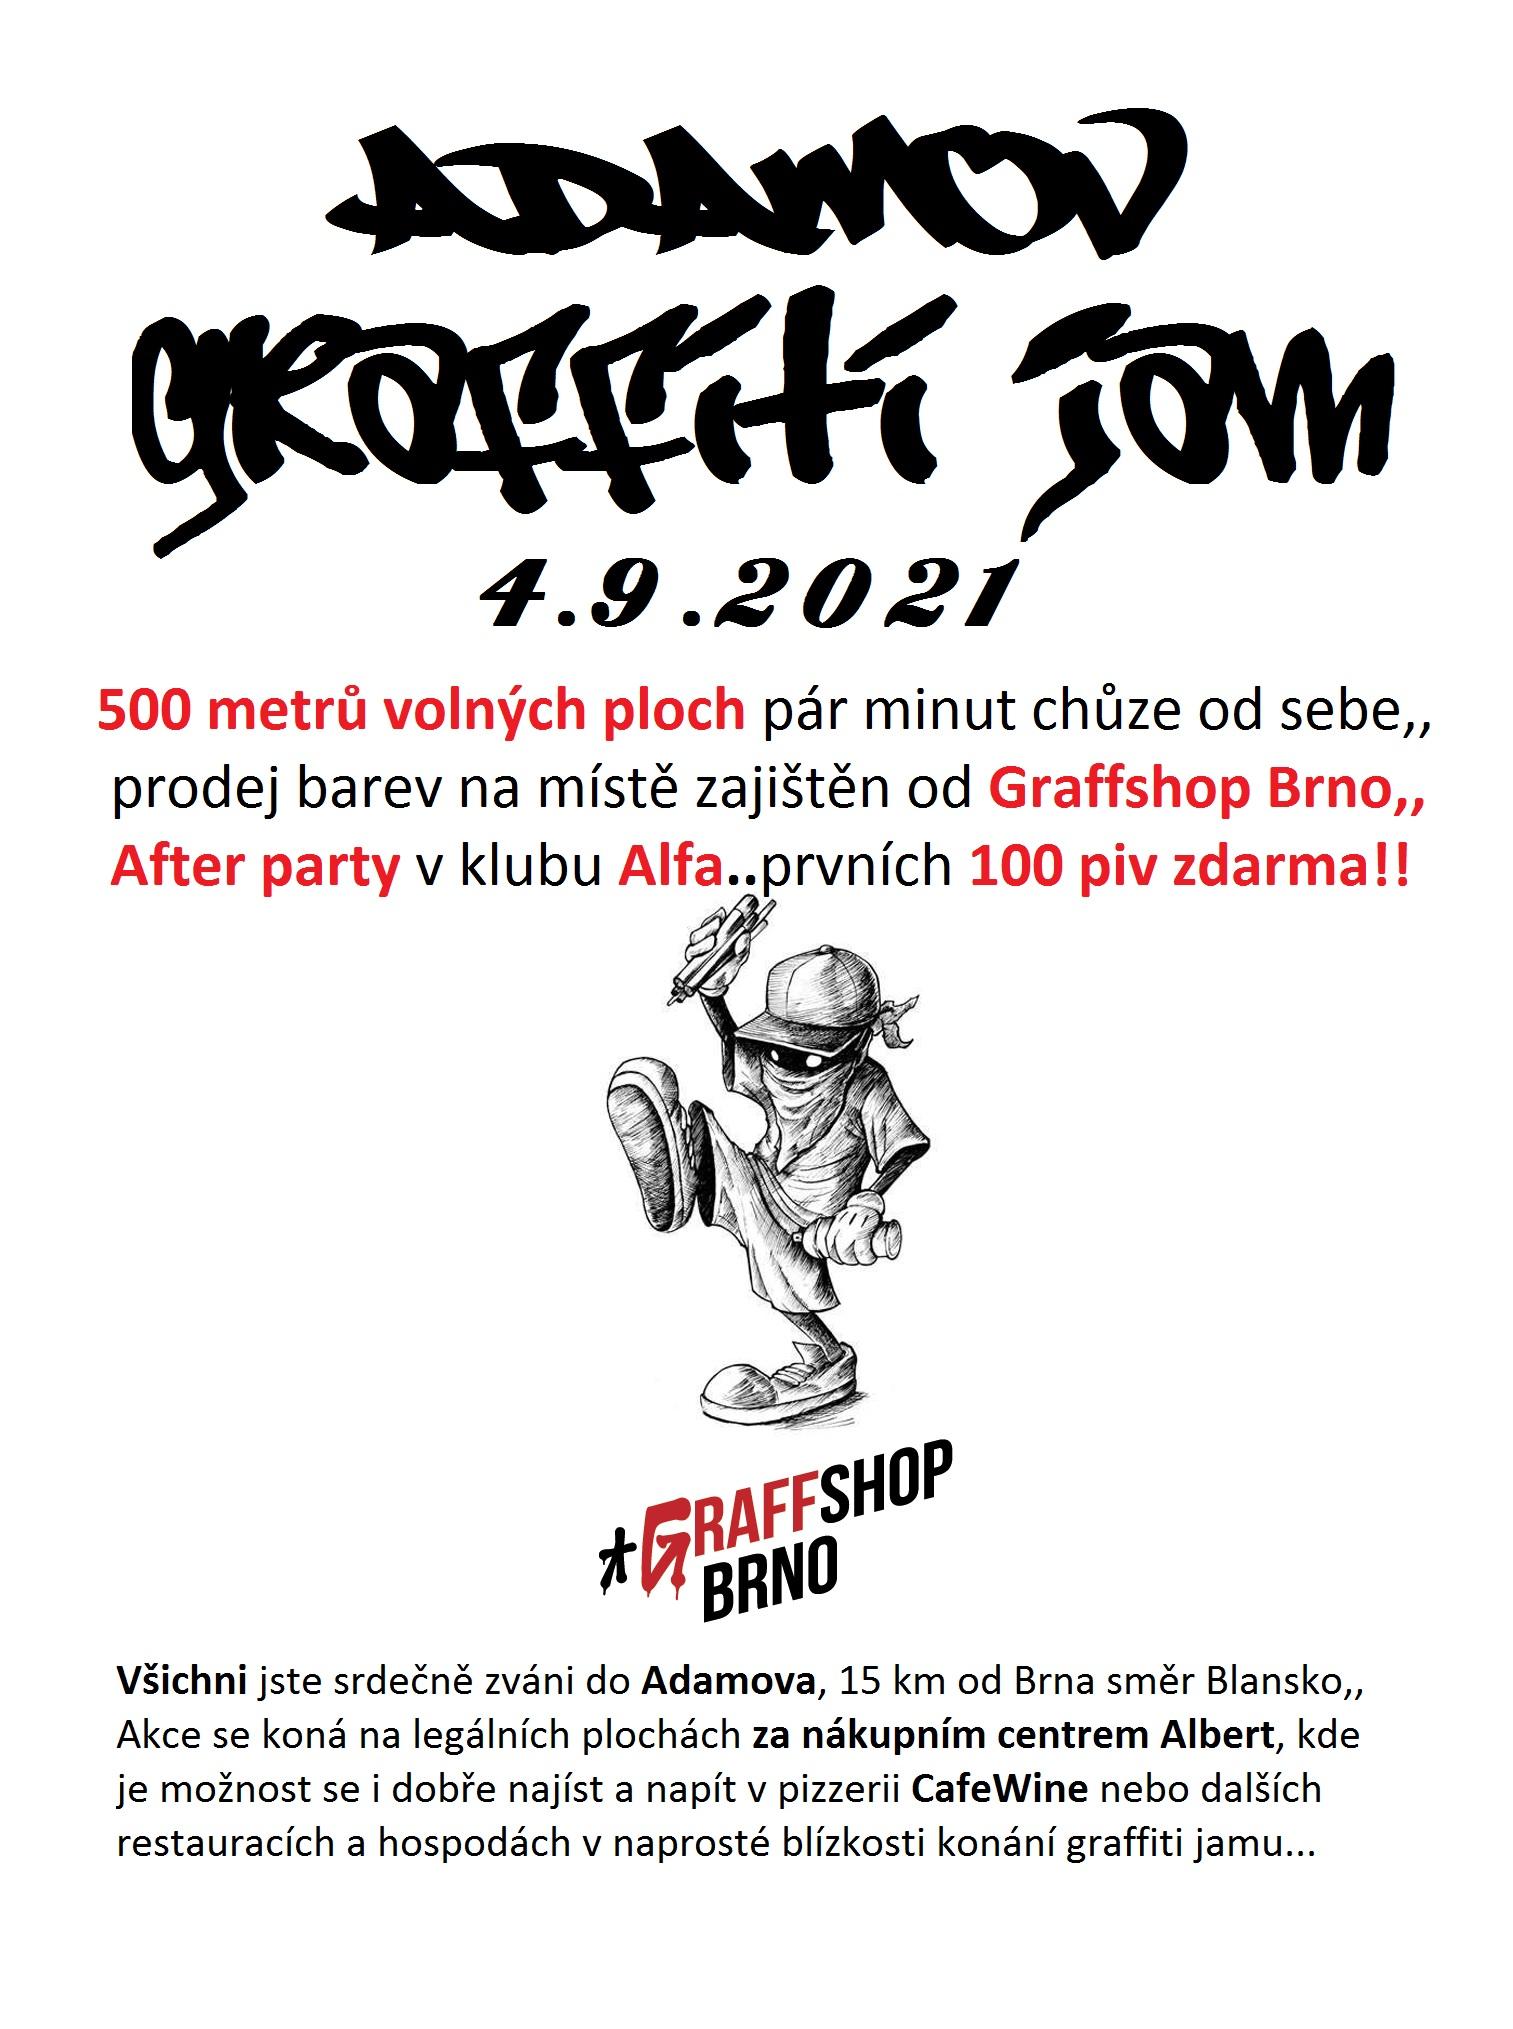 Graffiti Jam - Adamov (2021)